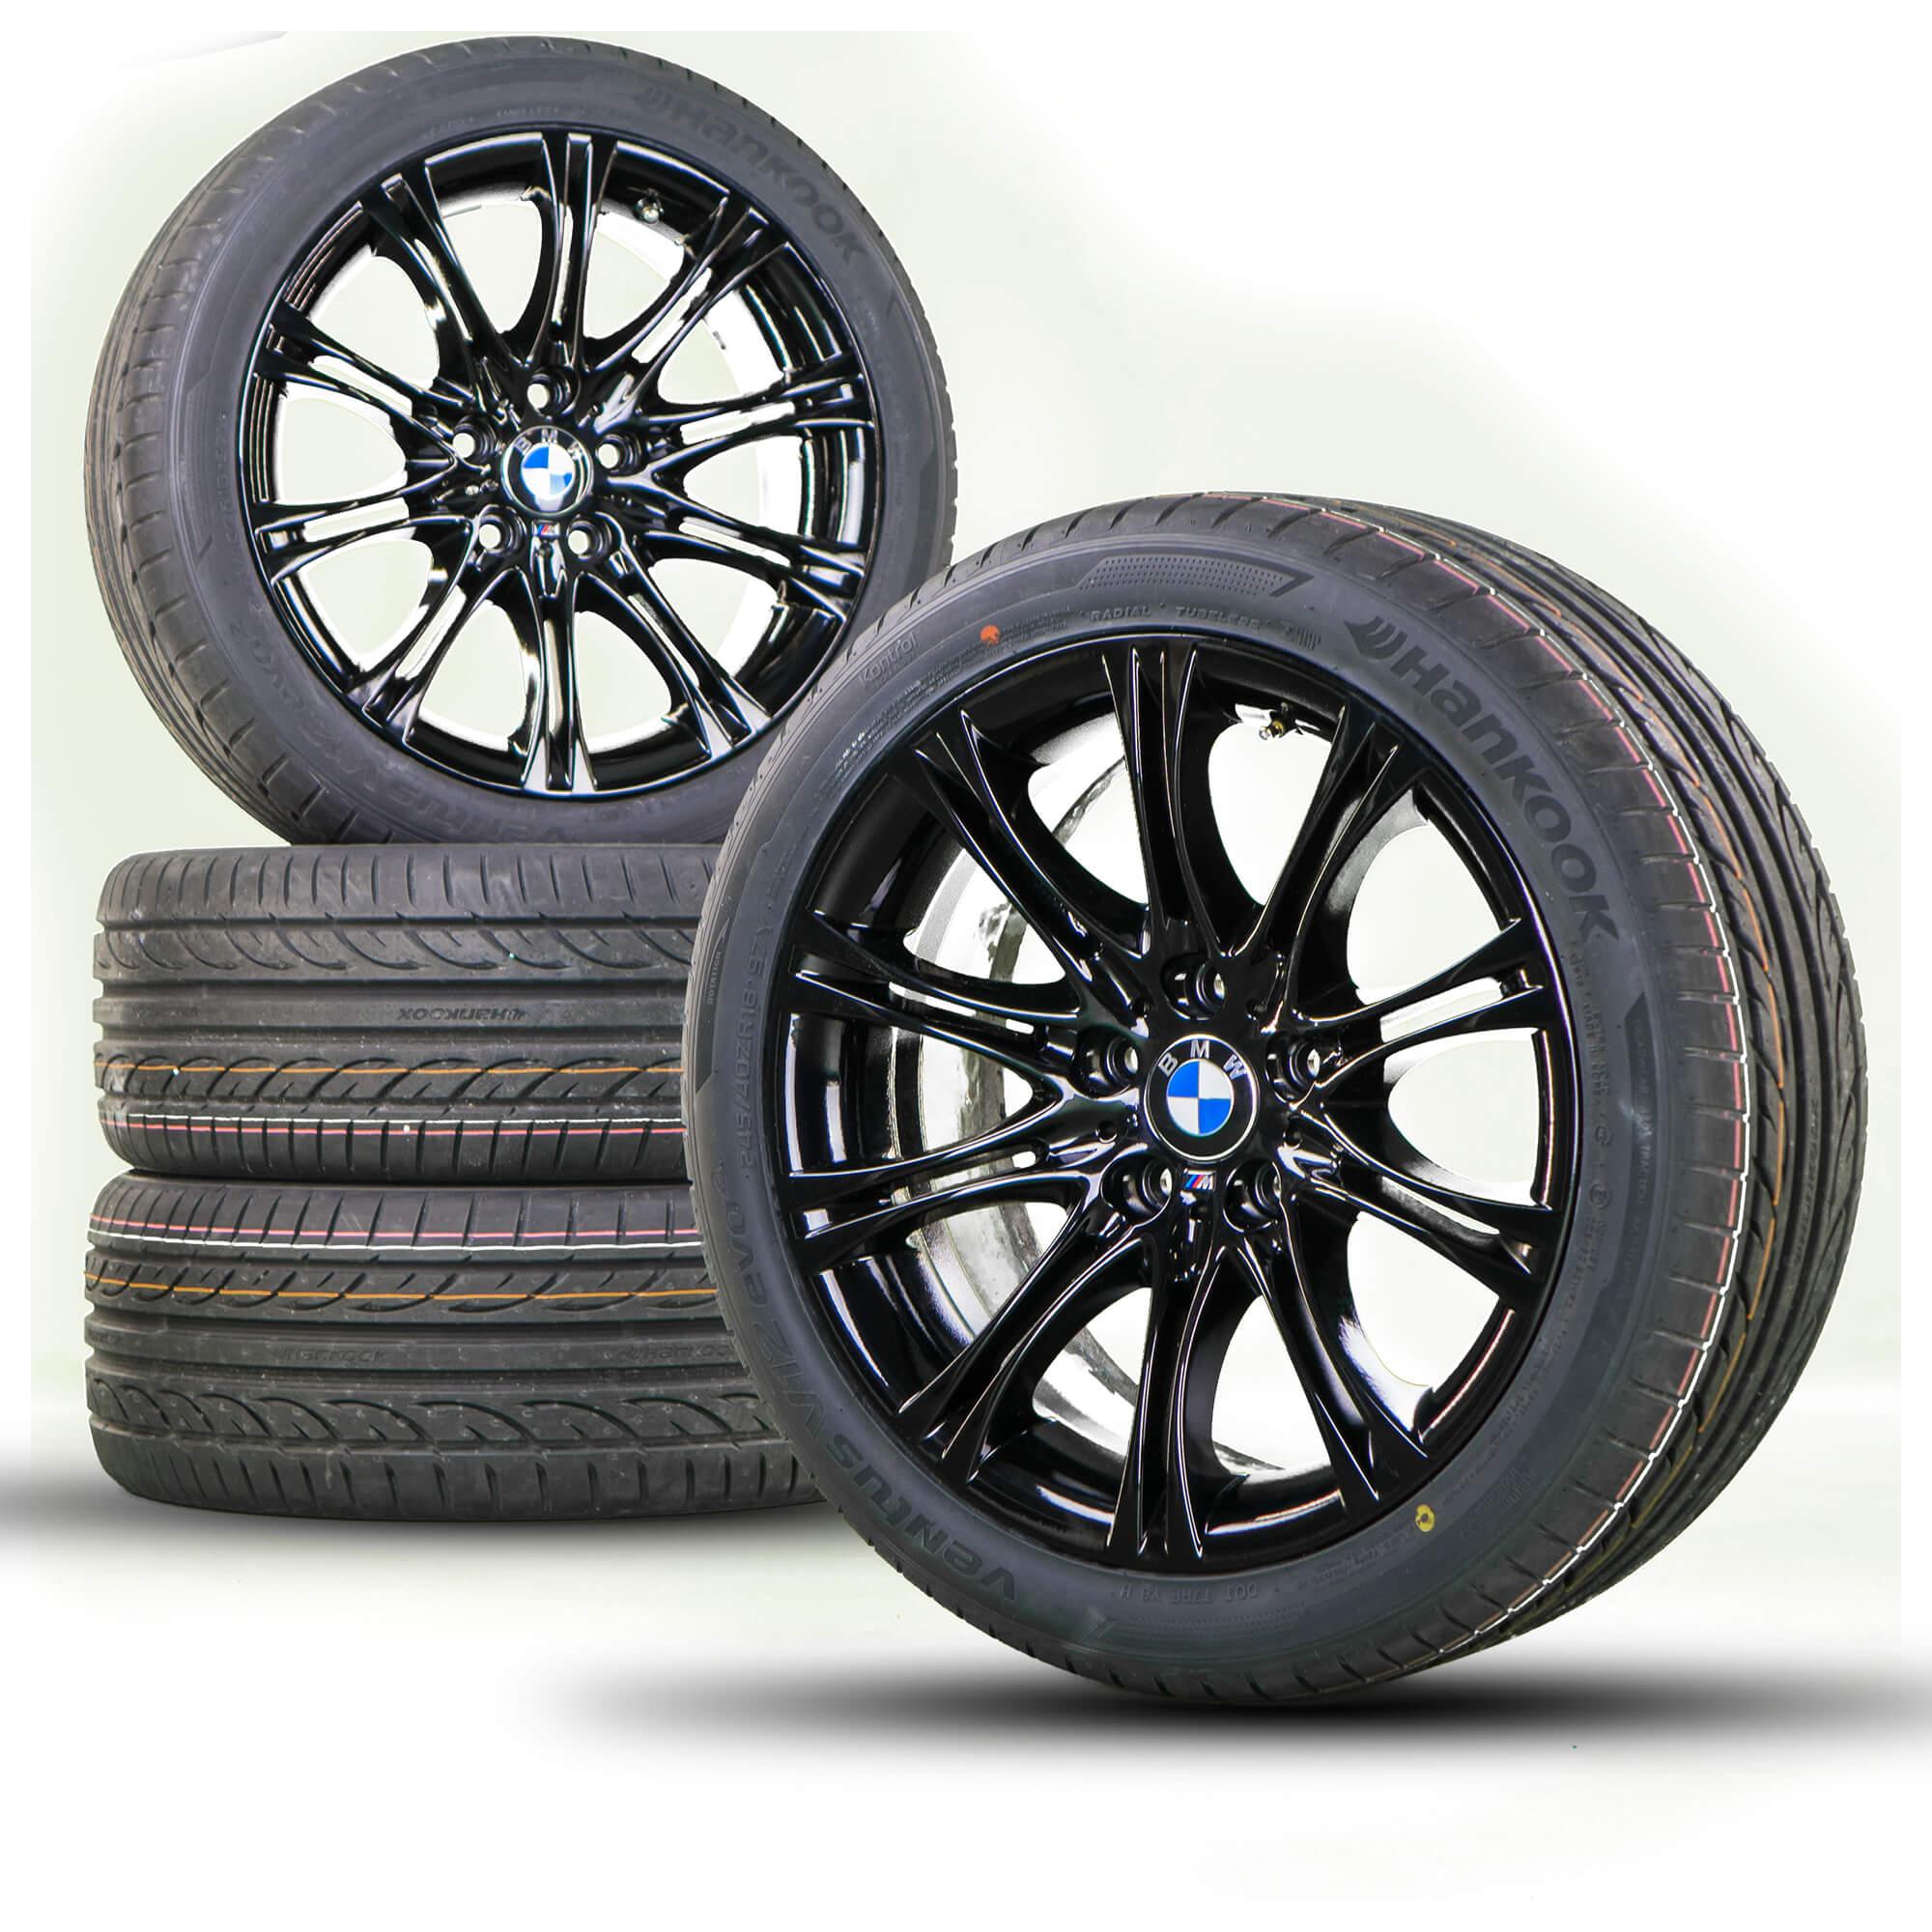 BMW 5 Series E60 E61 18 Inch Rims M135 M 135 Alloy Wheels